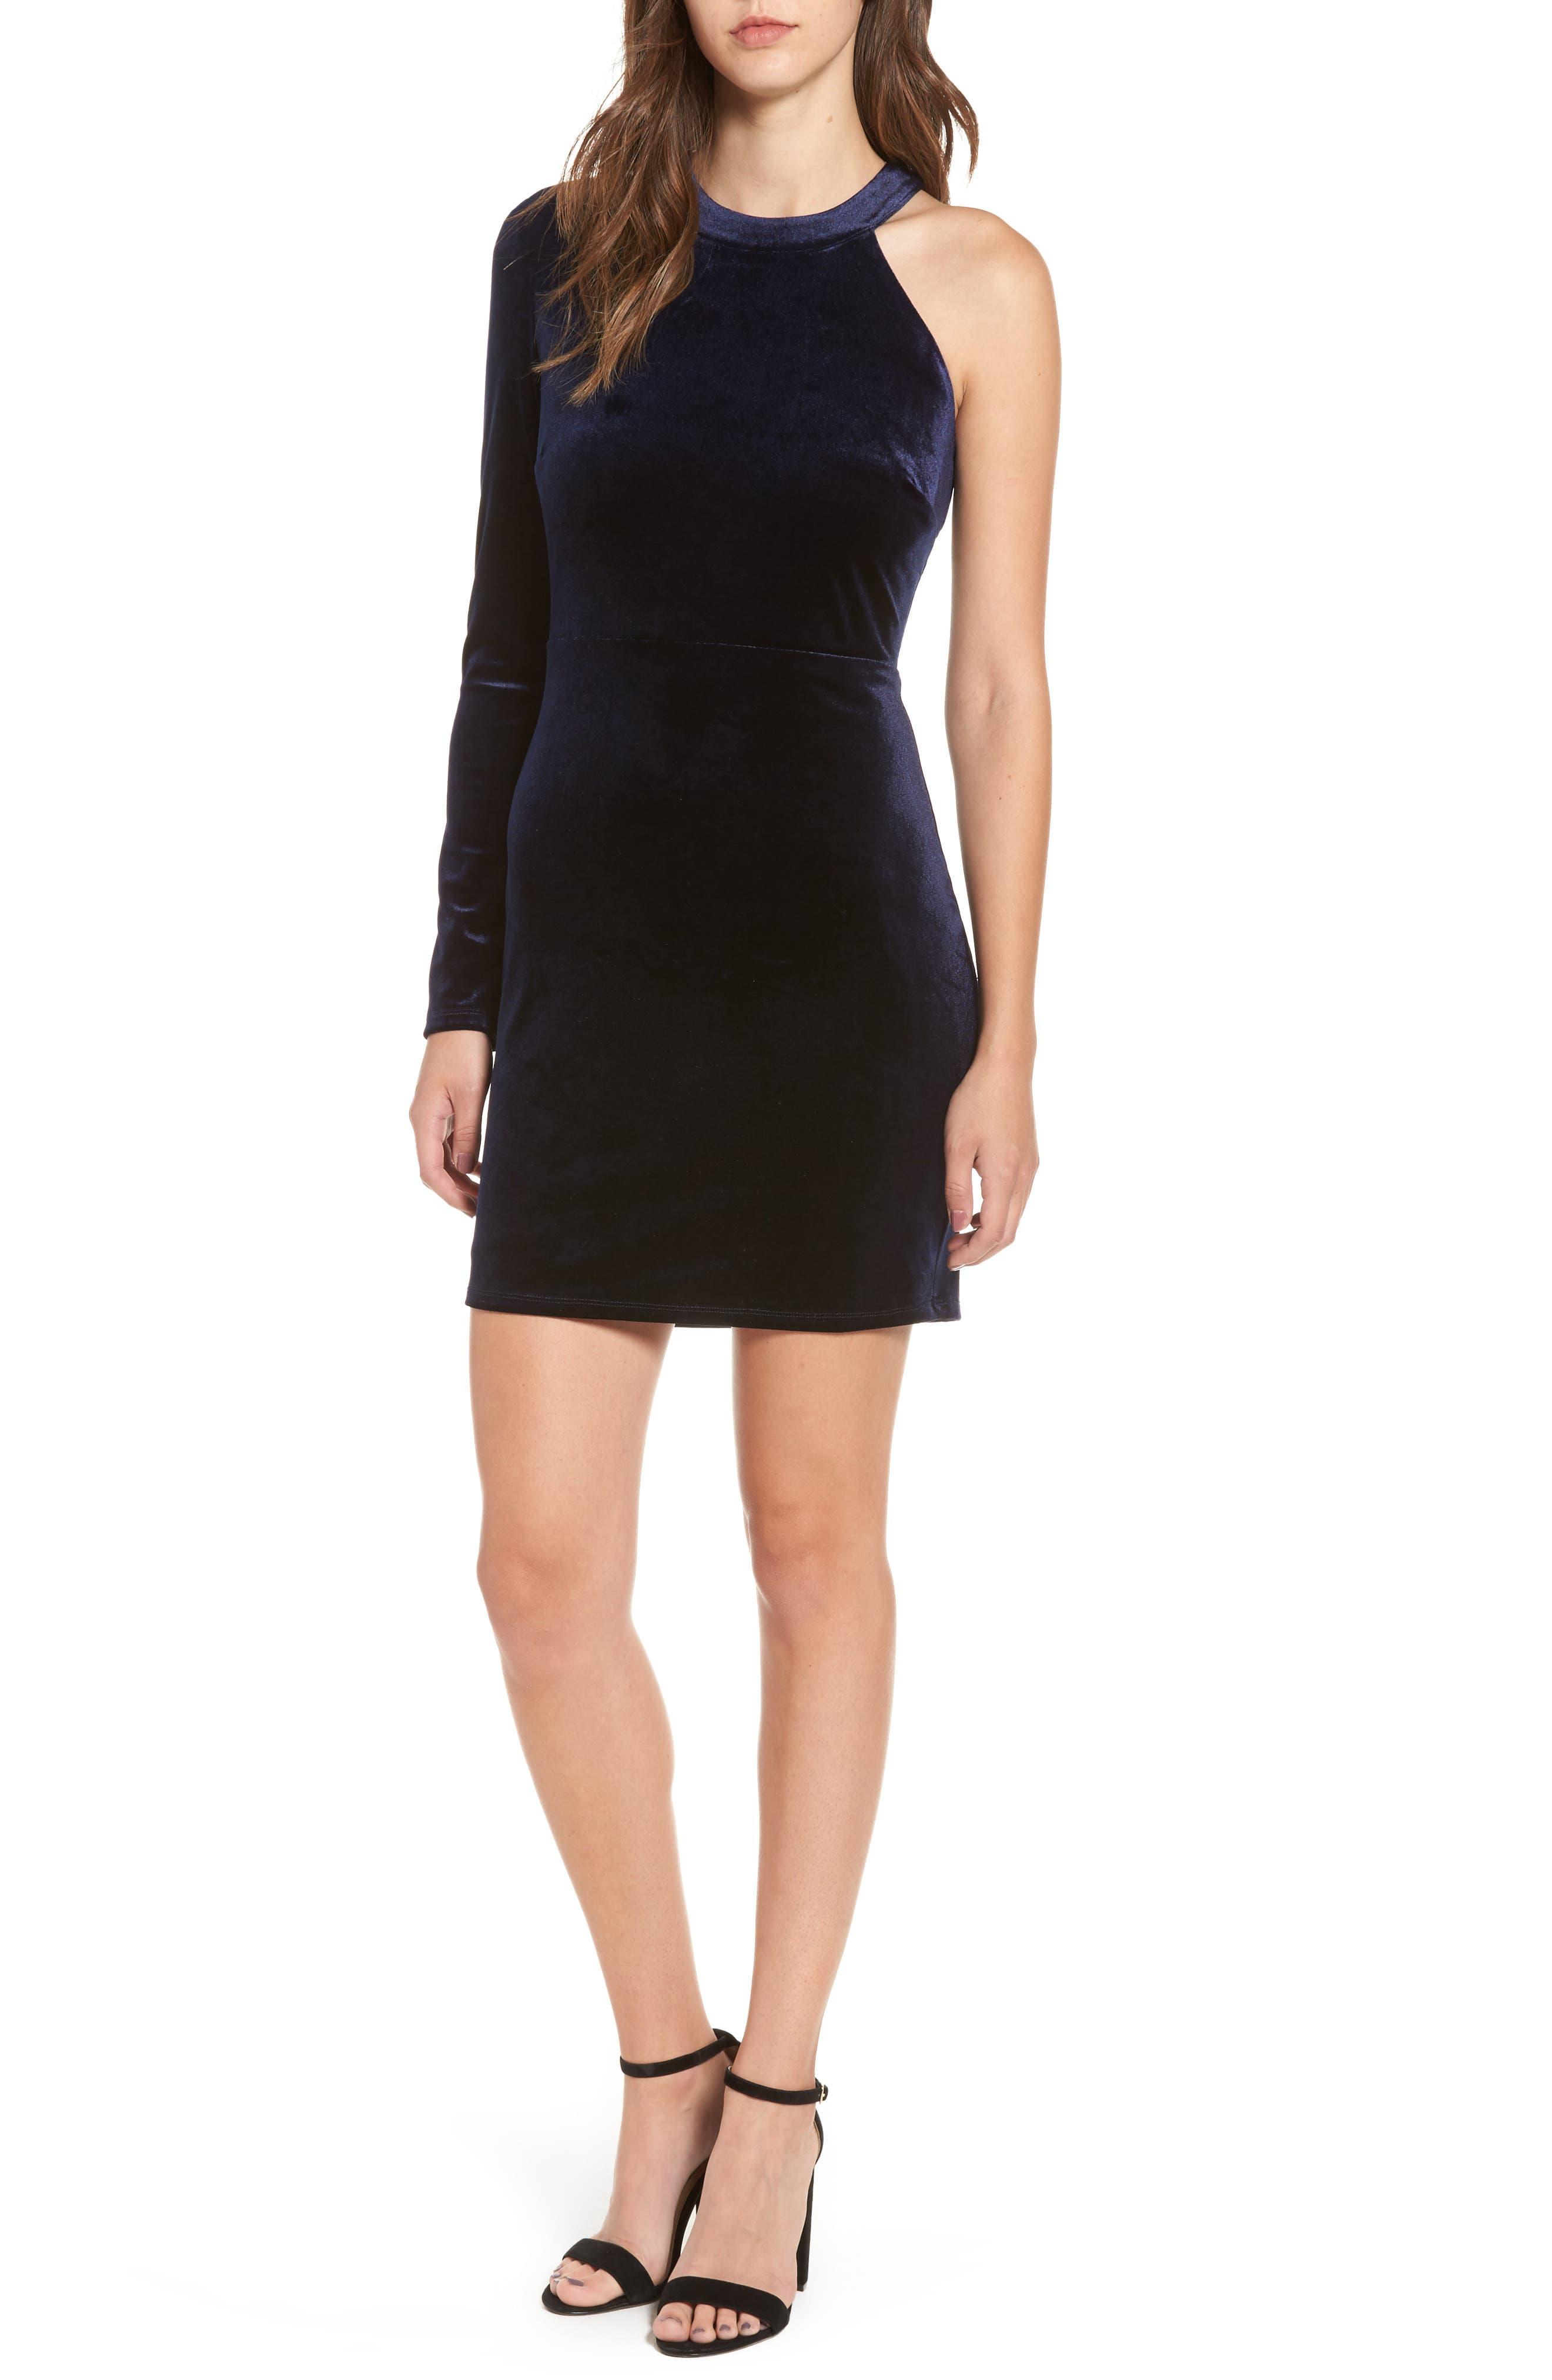 Alternate Image 1 Selected - ASTR the Label One-Shoulder Velvet Body-Con Dress